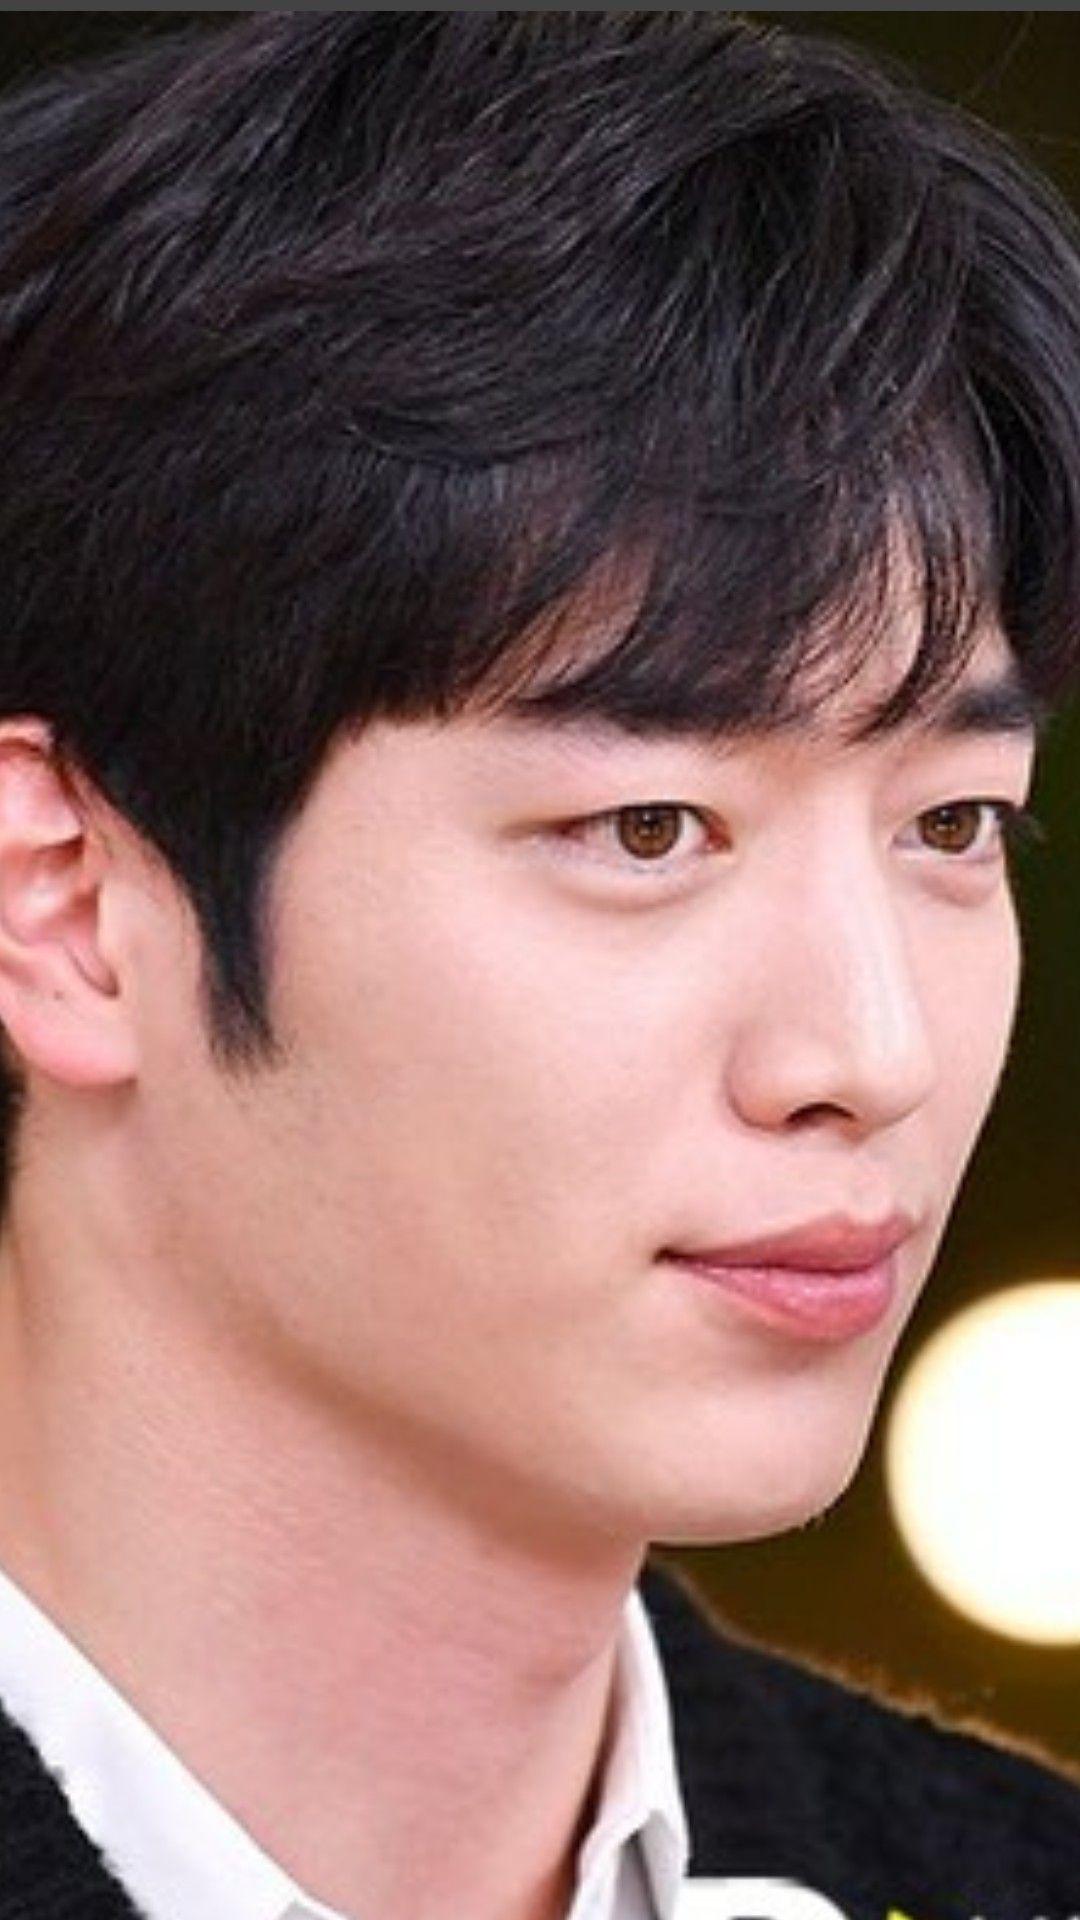 Pin by Ommalicious Me on my kind of man ❤ | Seo kang joon ...에 대한 갤러리